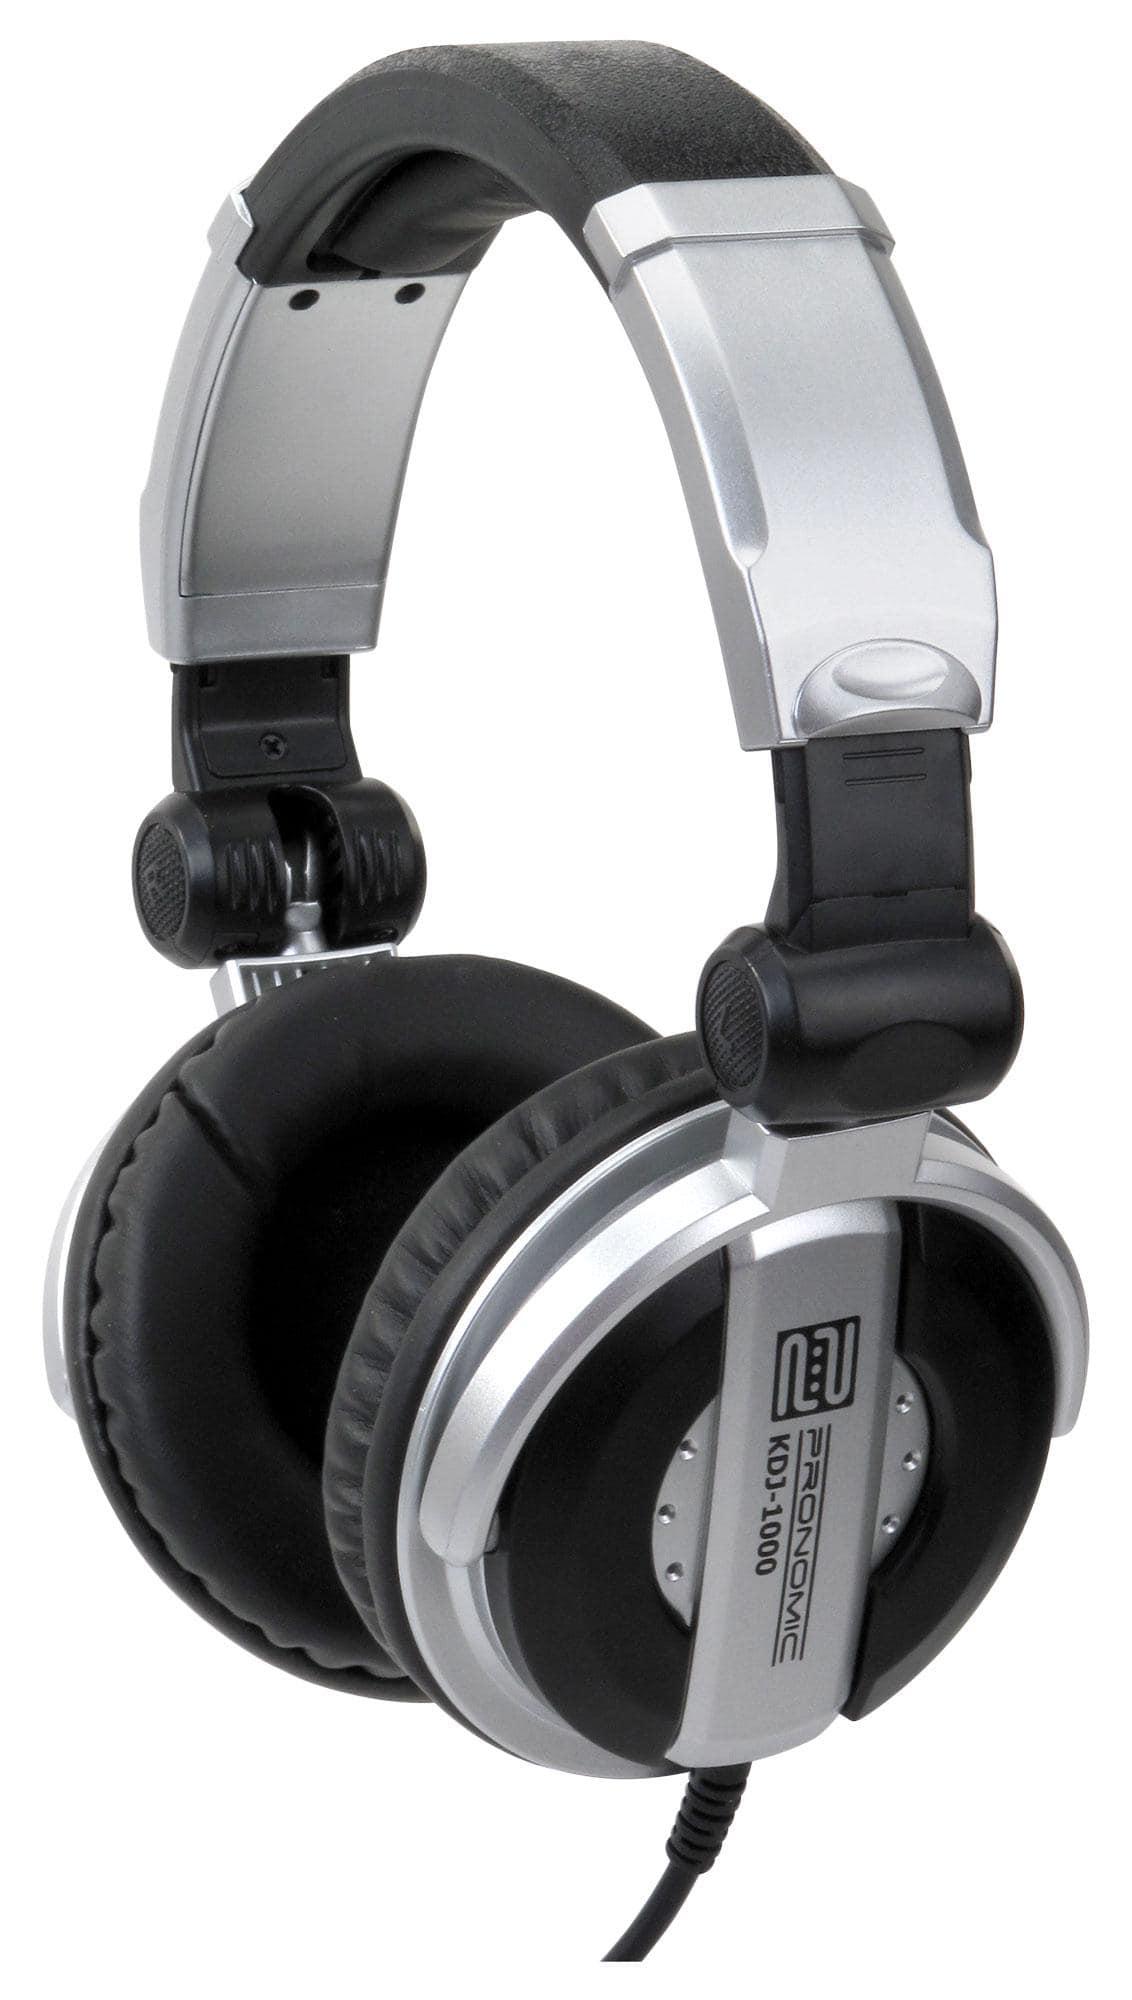 Pronomic KDJ 1000 DJ Kopfhörer Retoure (Zustand sehr gut)